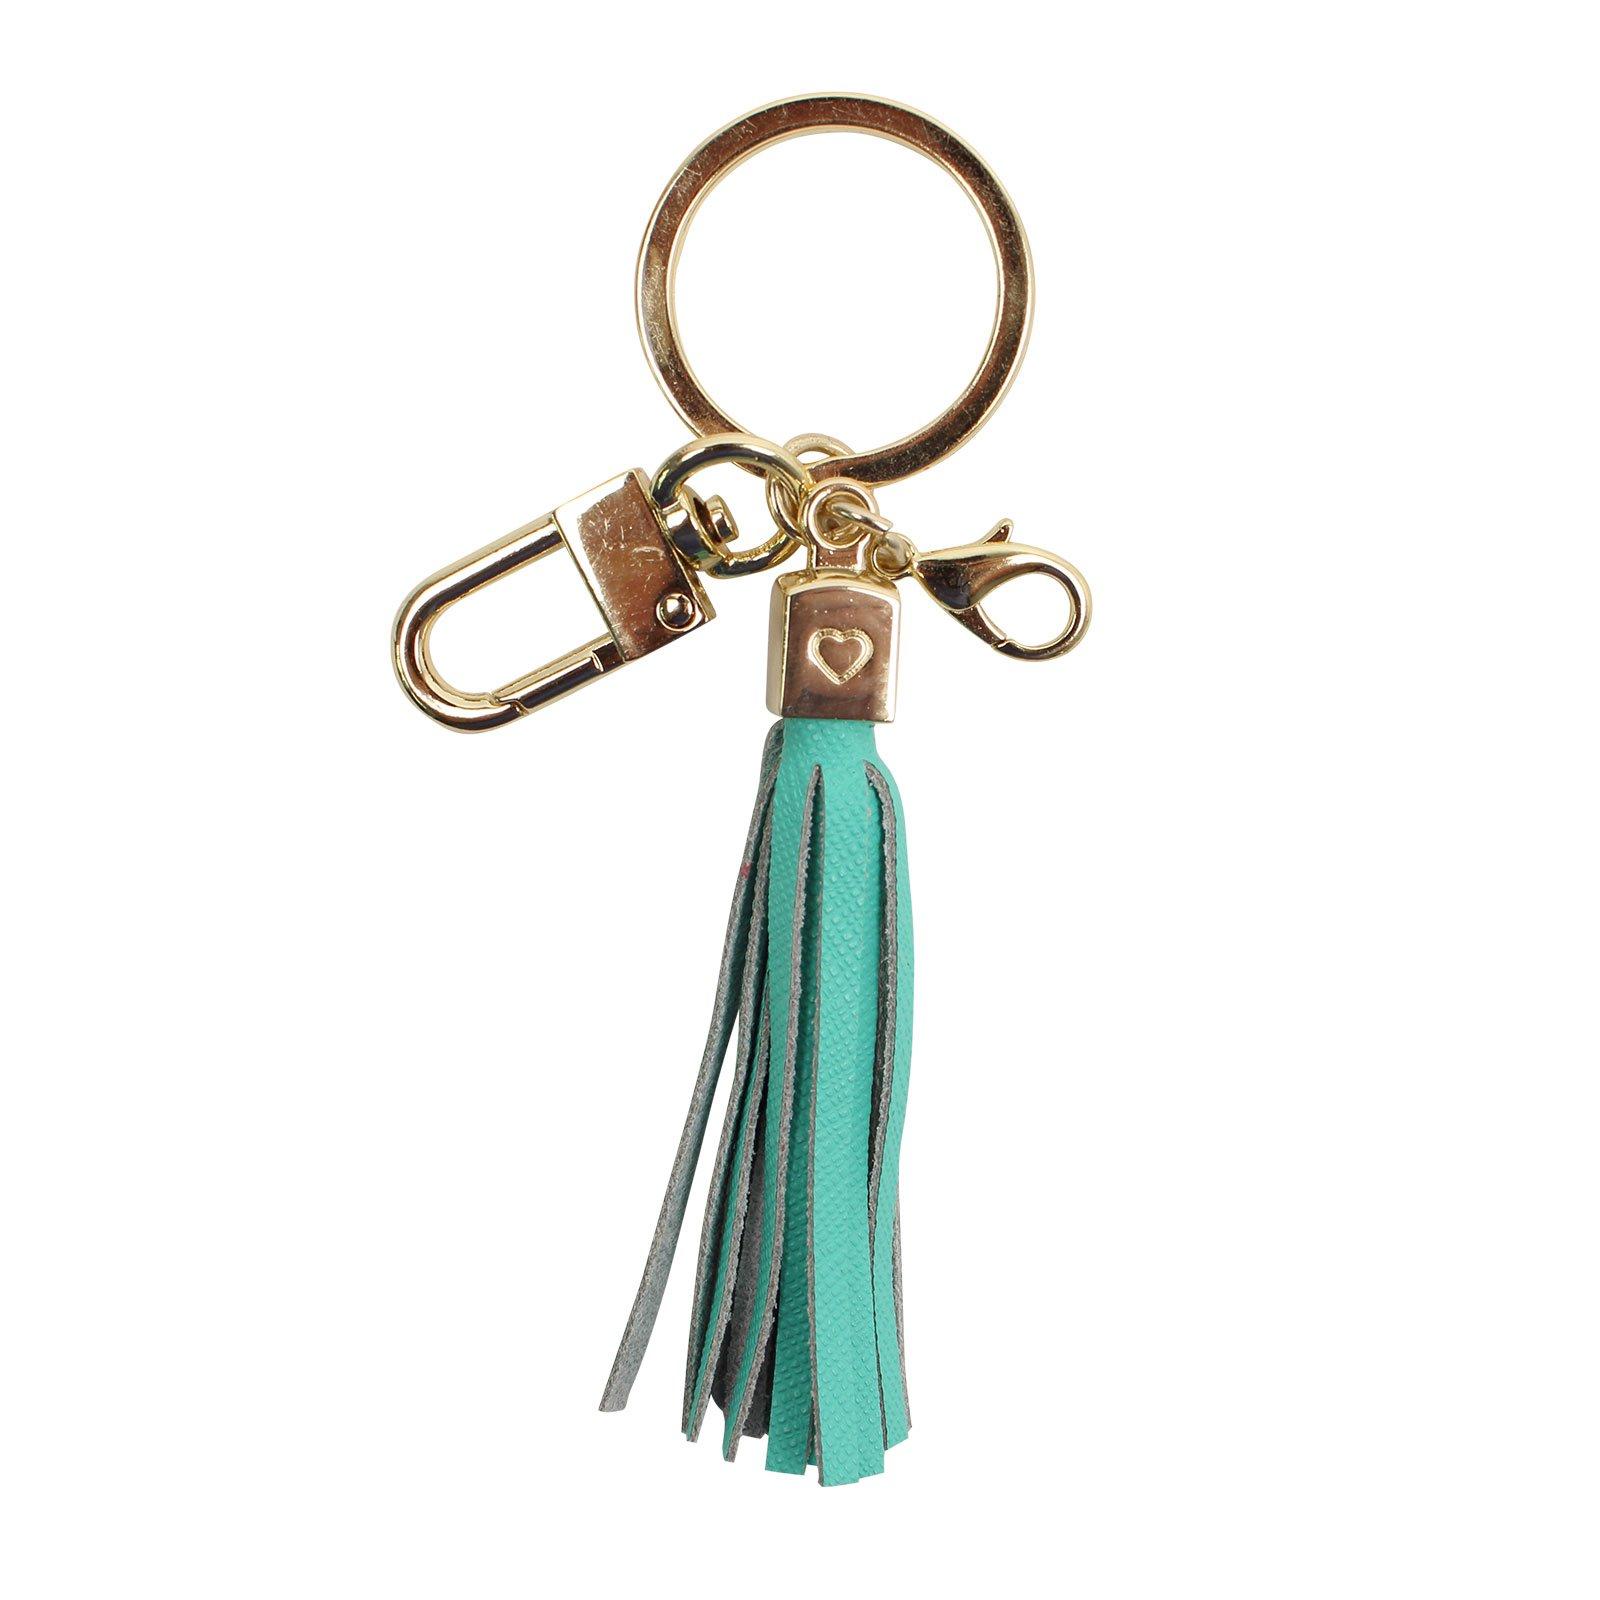 Womens's Leather Tassel Charm Women Handbag Wallet Accessories Key Rings (Mint-Small)